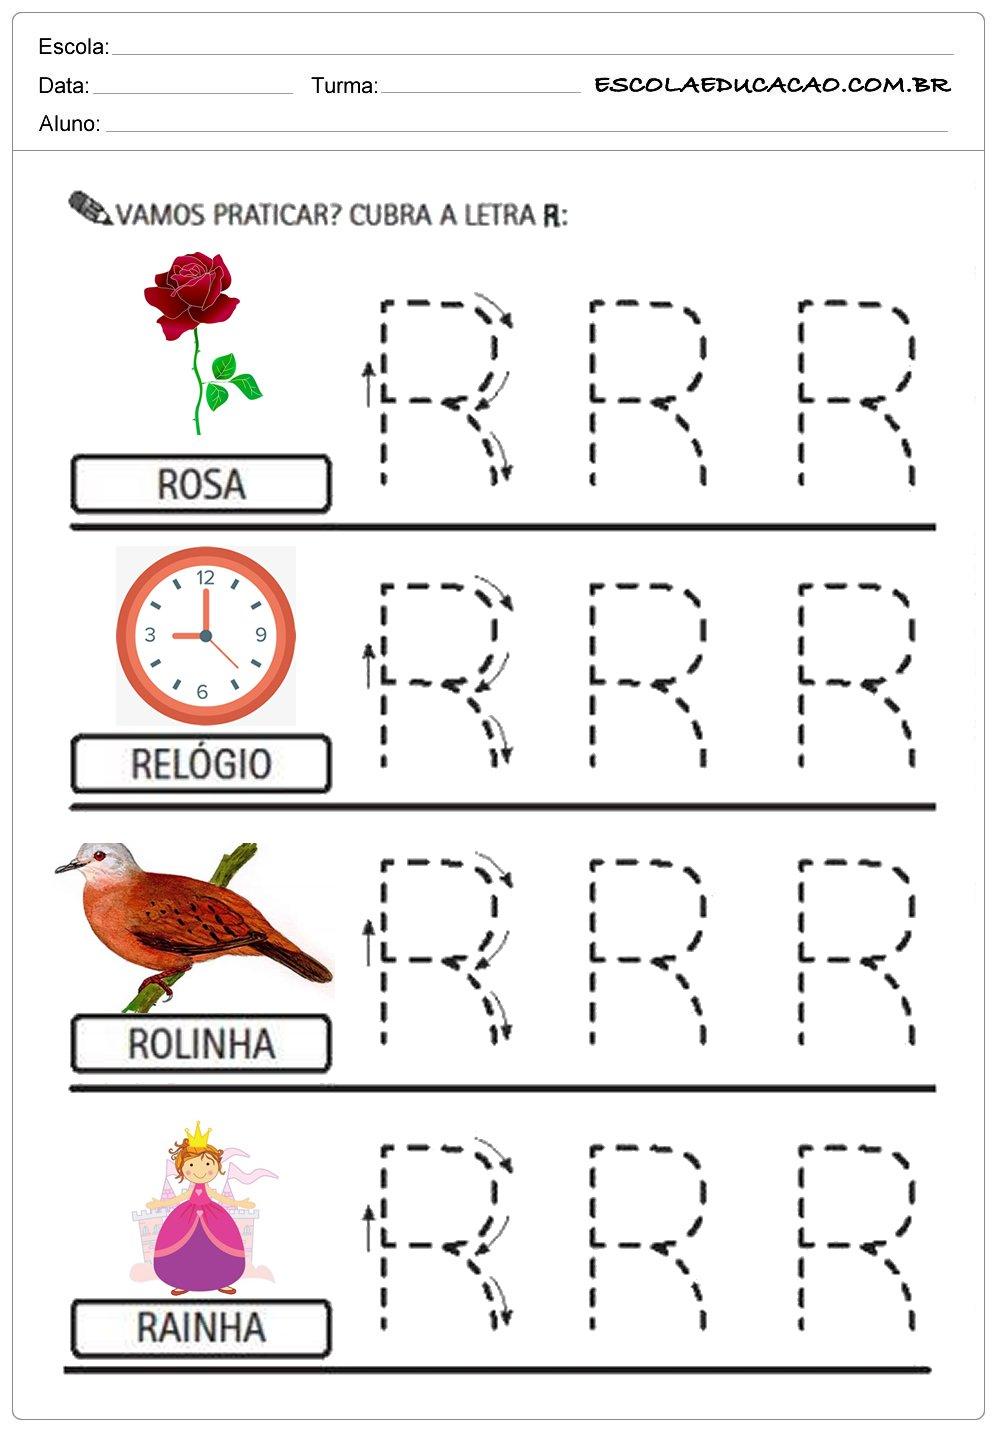 Cubra a letra R